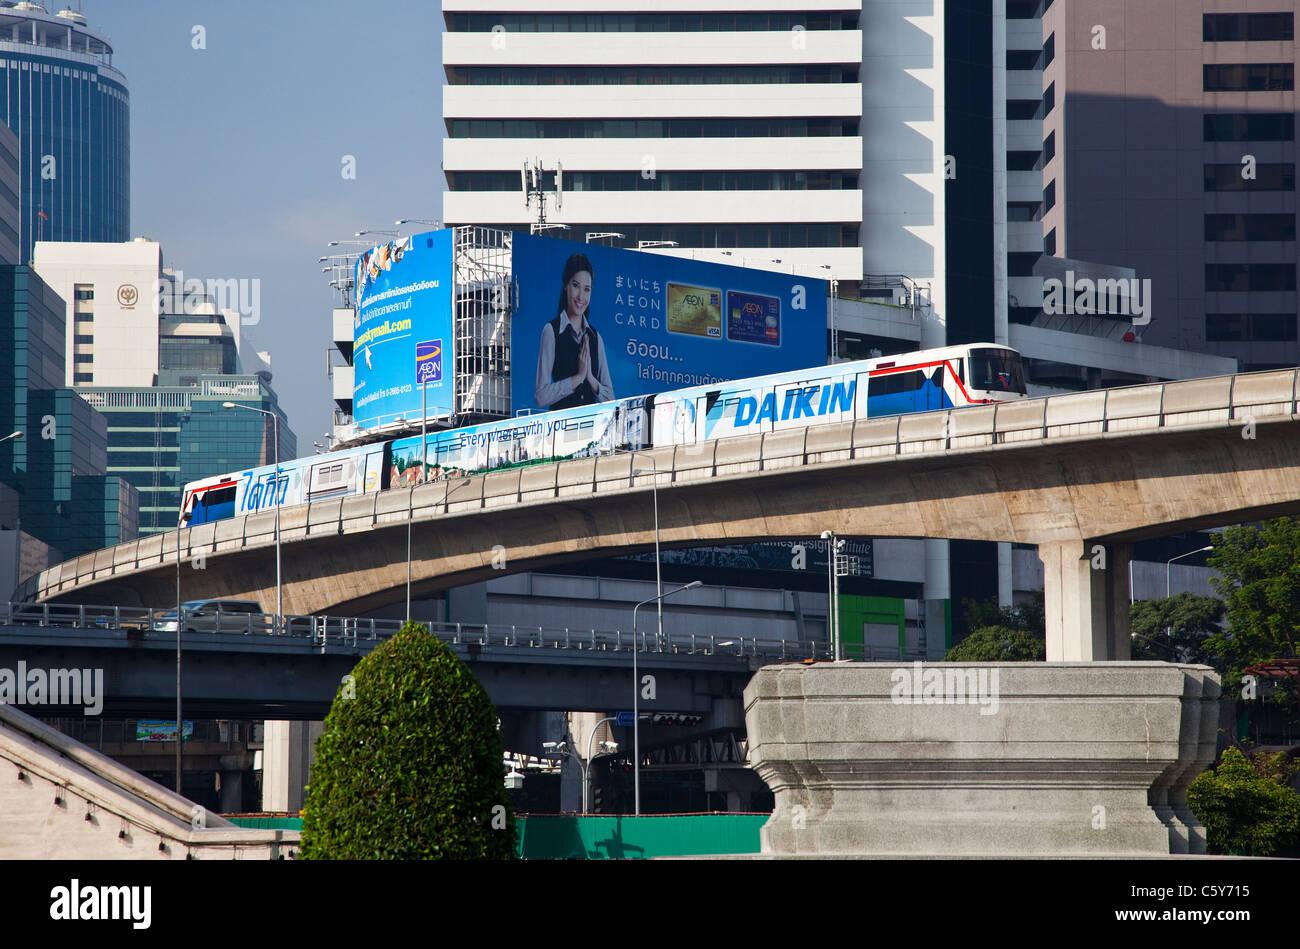 The Skytrain in Bangkok, Thailand Stock Photo